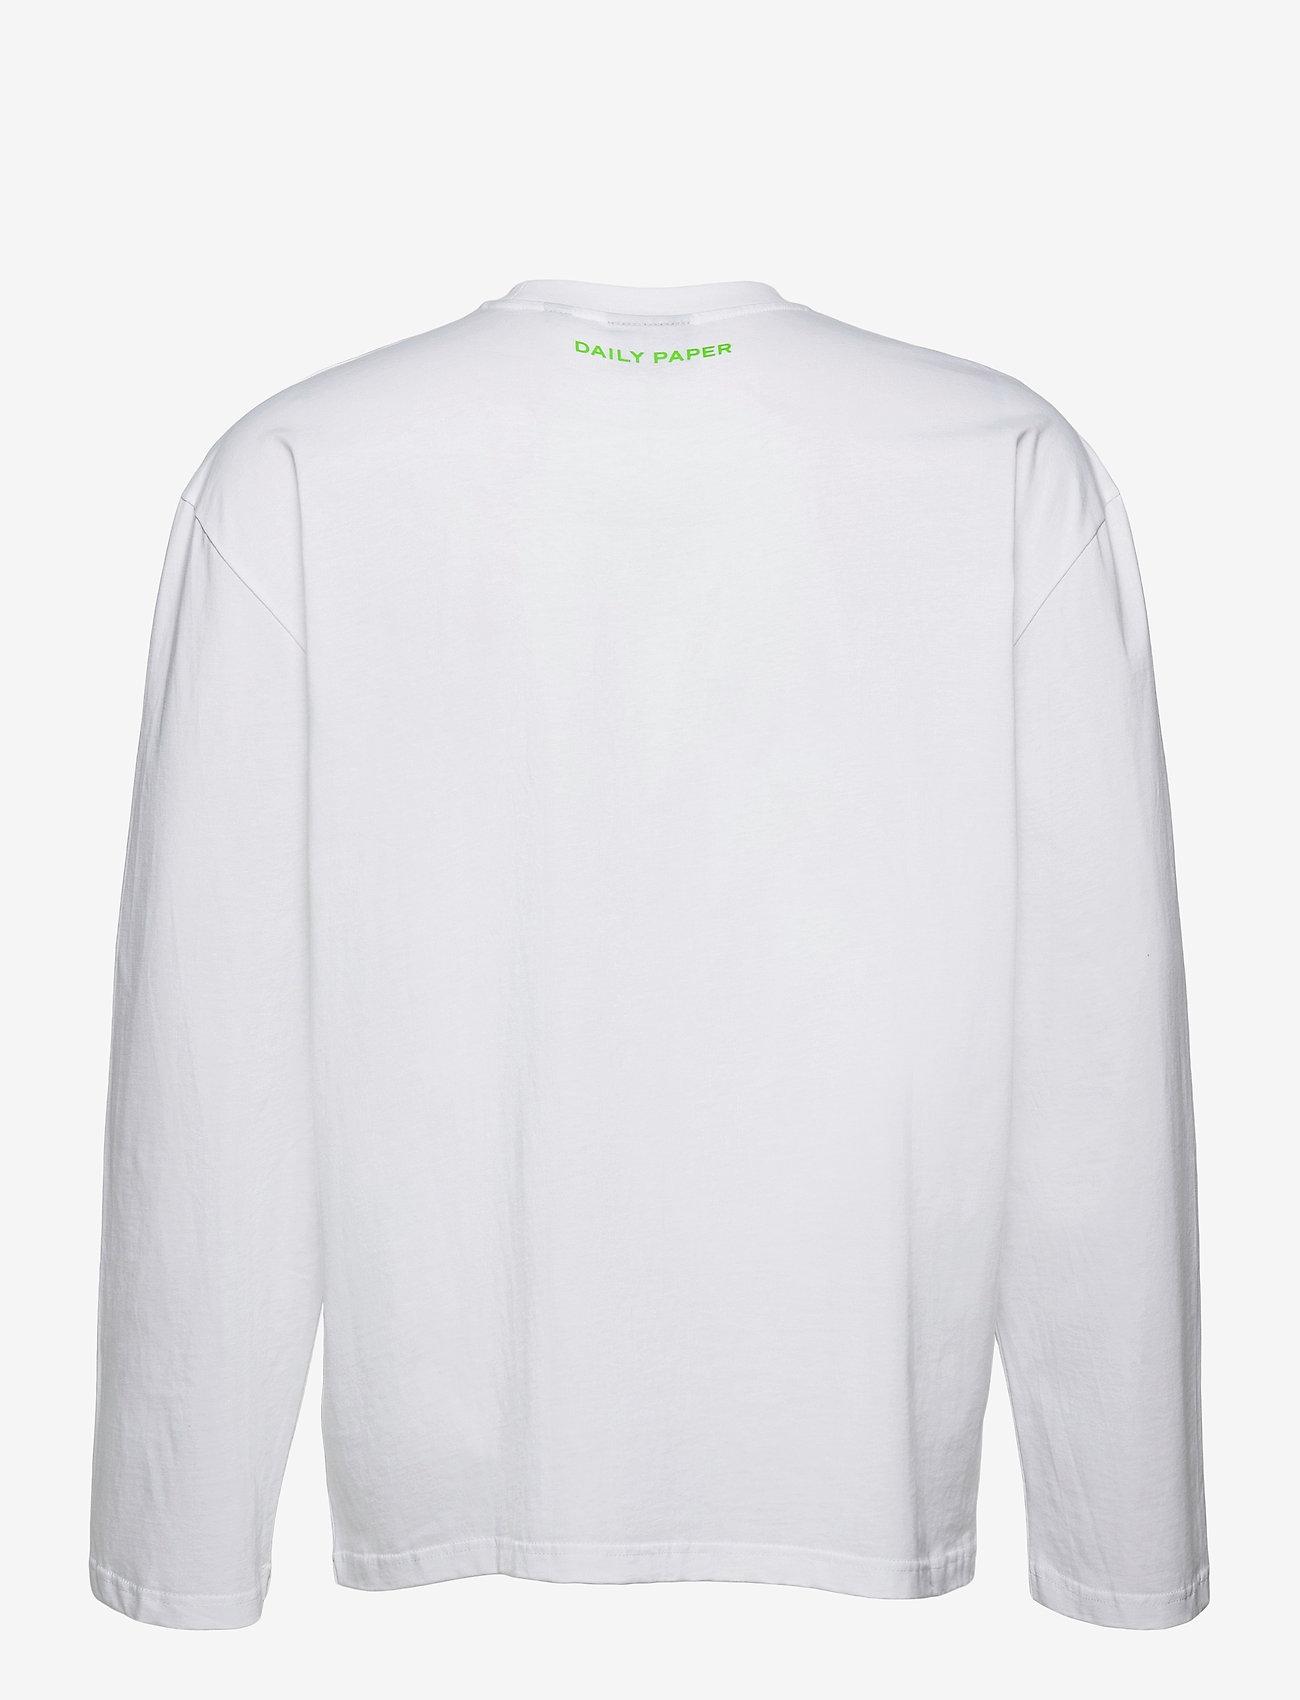 Daily Paper - Kanwhi - t-shirts à manches longues - white - 1